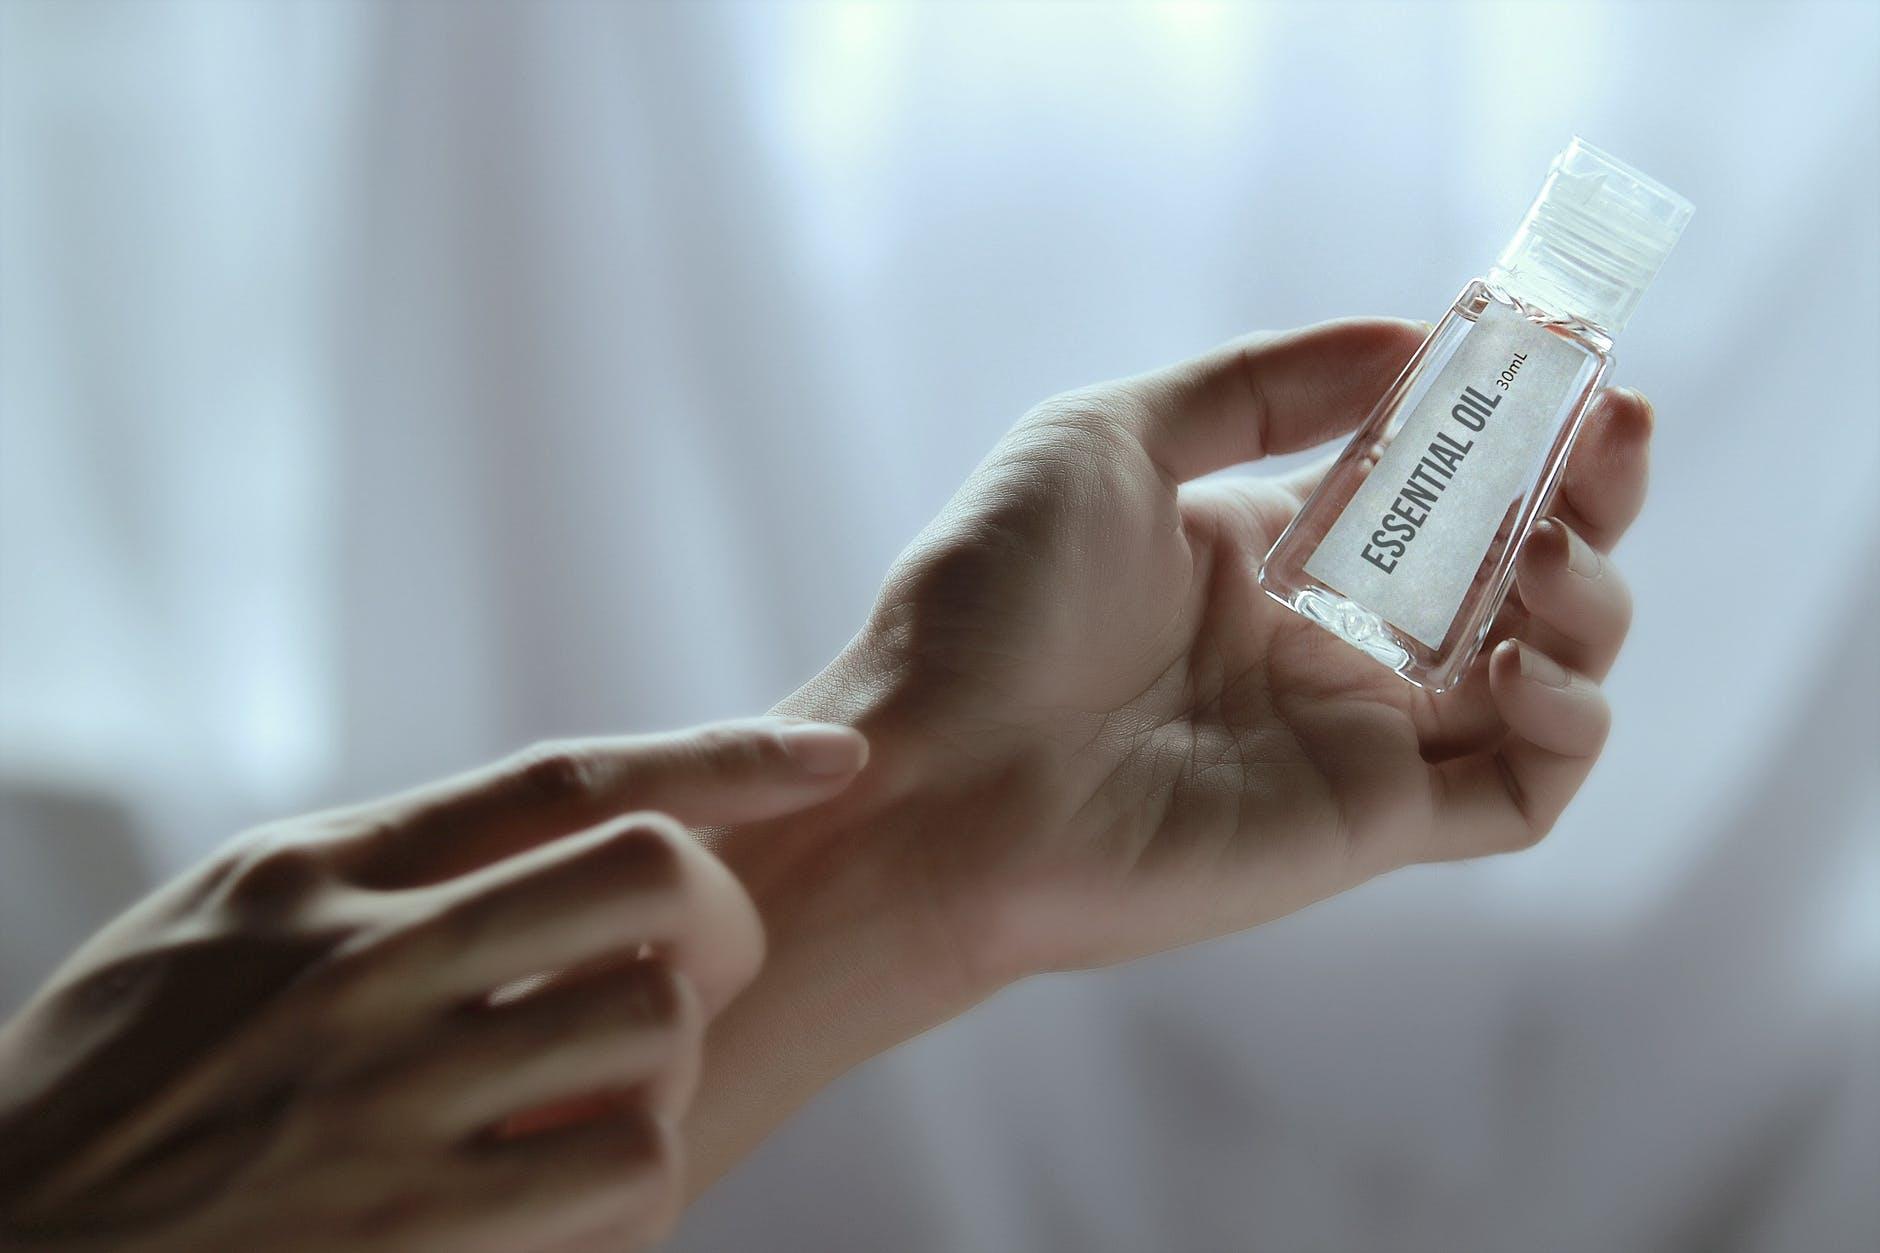 aromatherapy beauty blur bottle